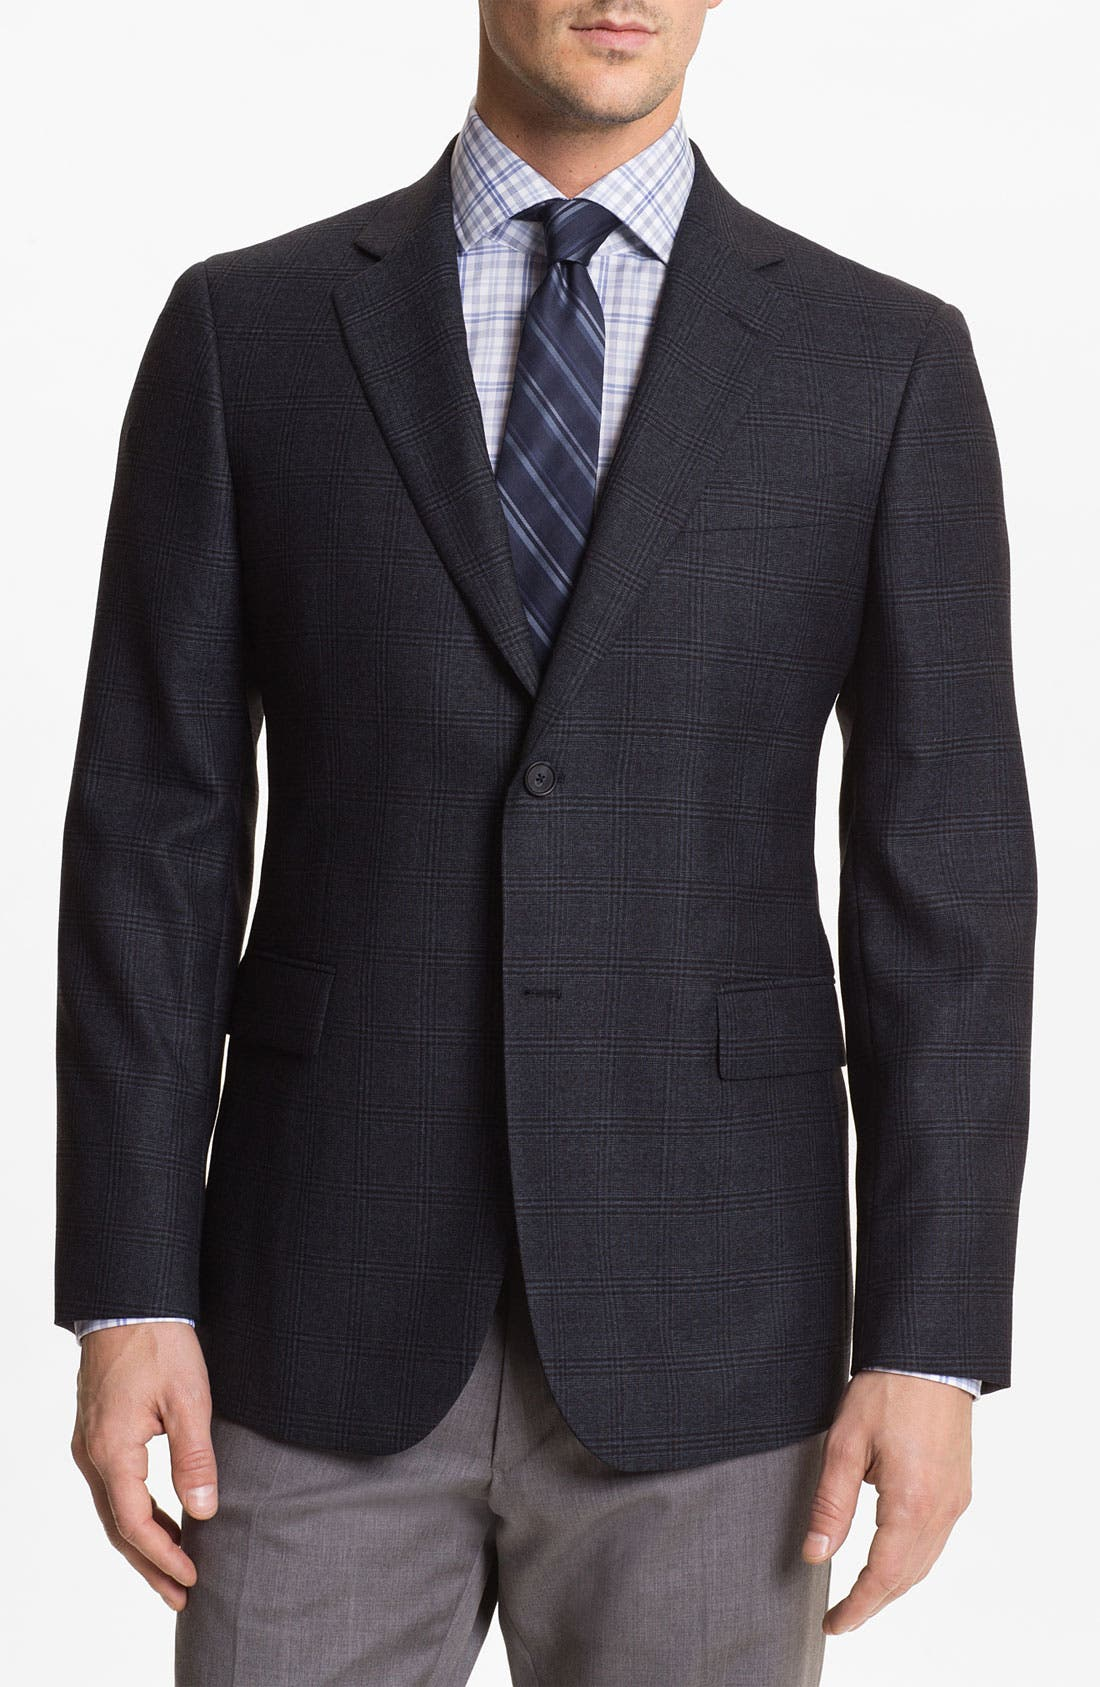 Main Image - John W. Nordstrom® Plaid Wool Sportcoat